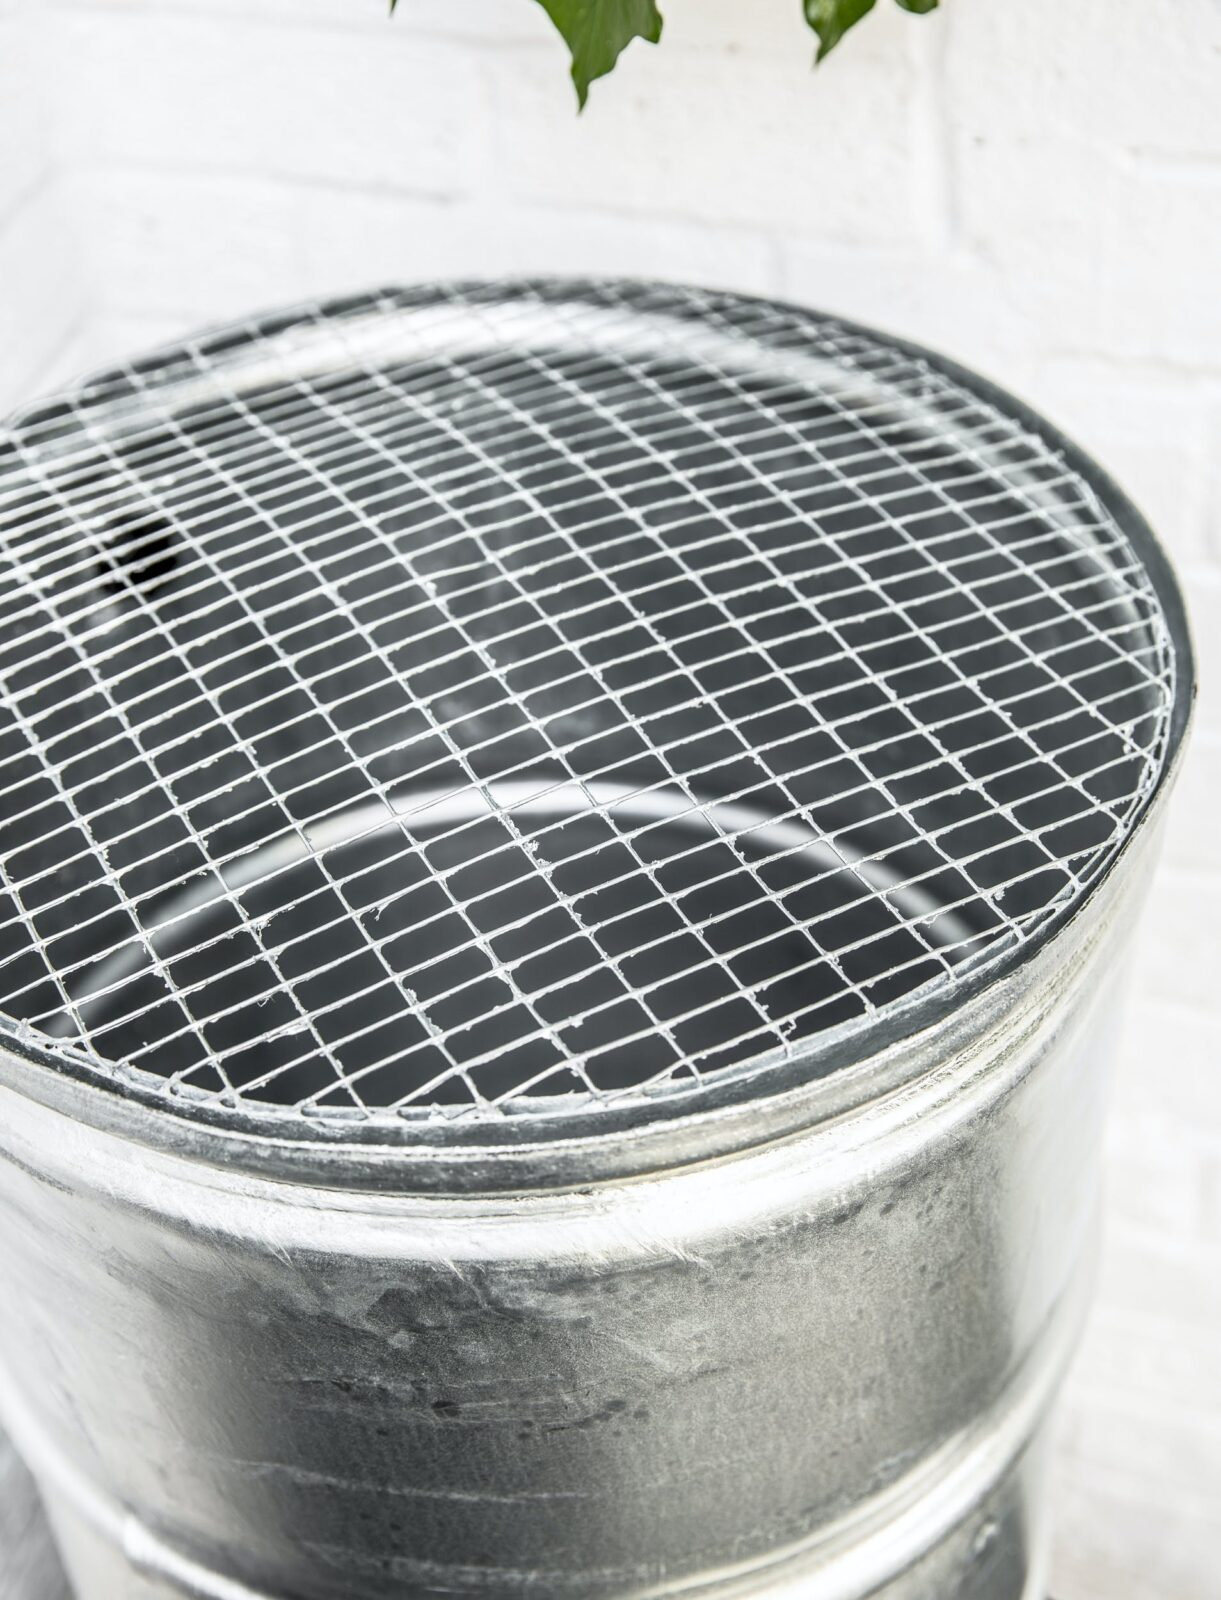 Water Butt - Galvanised Steel